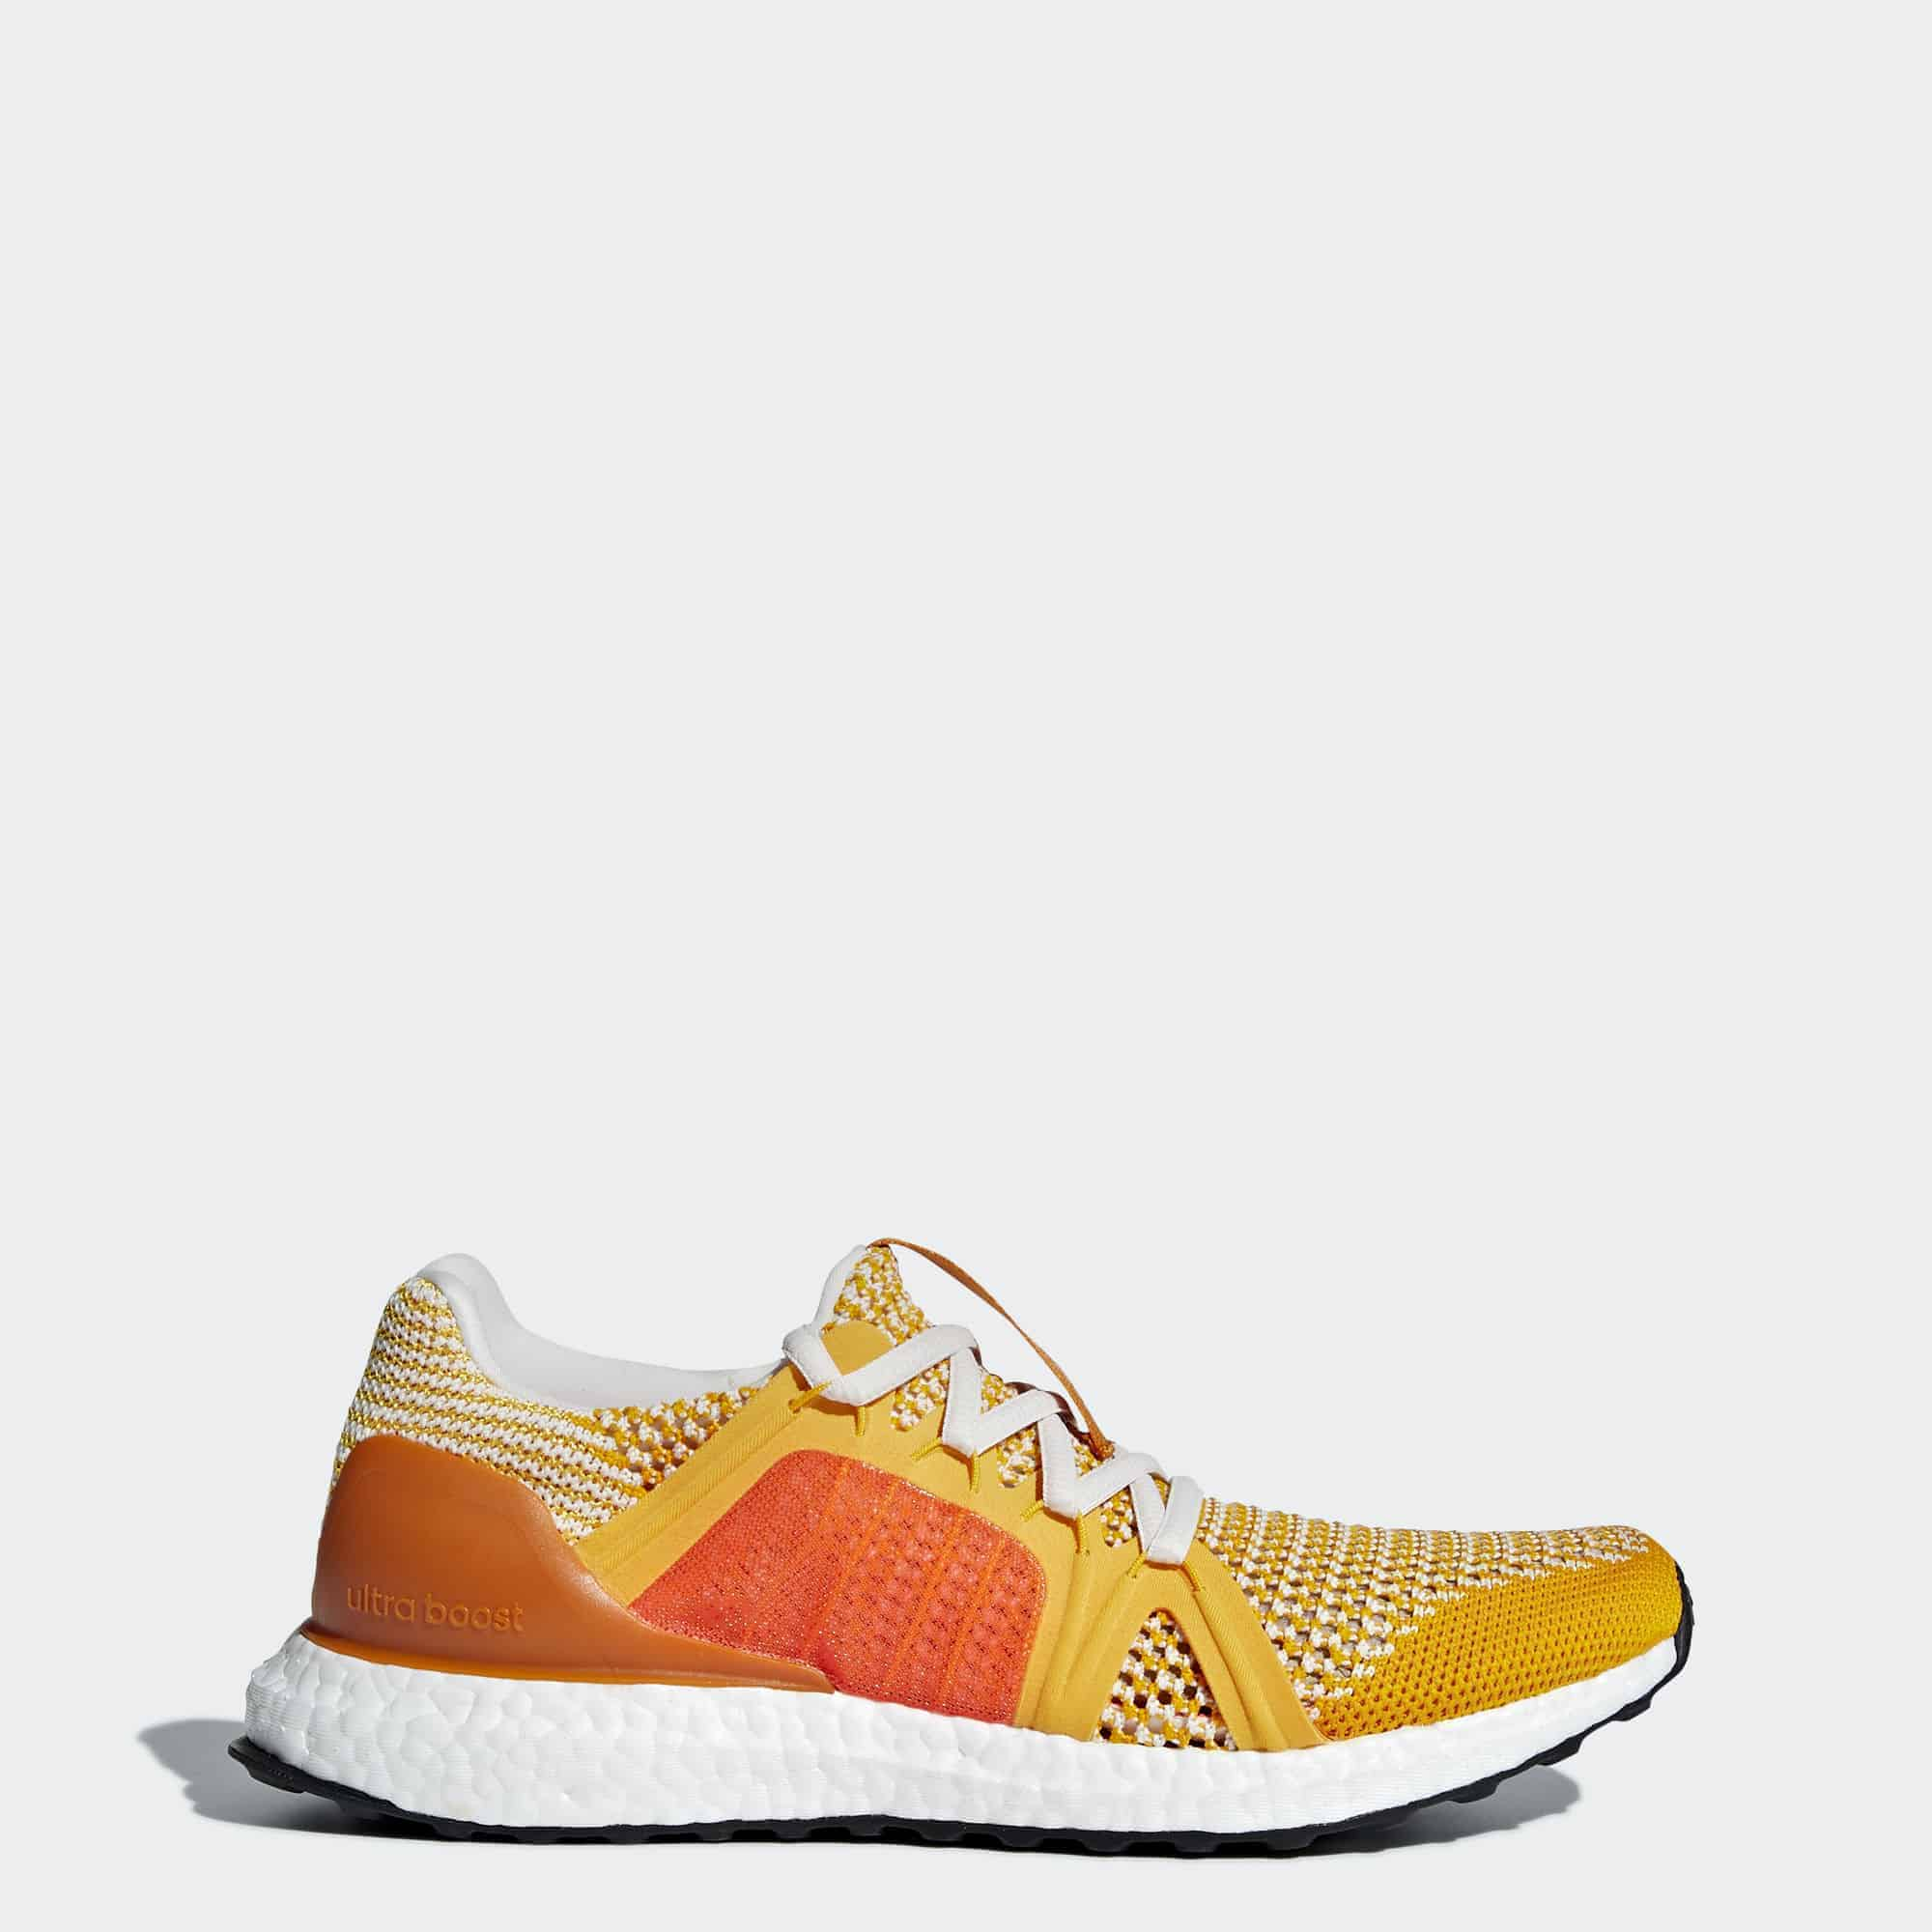 Кроссовки для бега Adidas Ultraboost by Stella McCartney женские